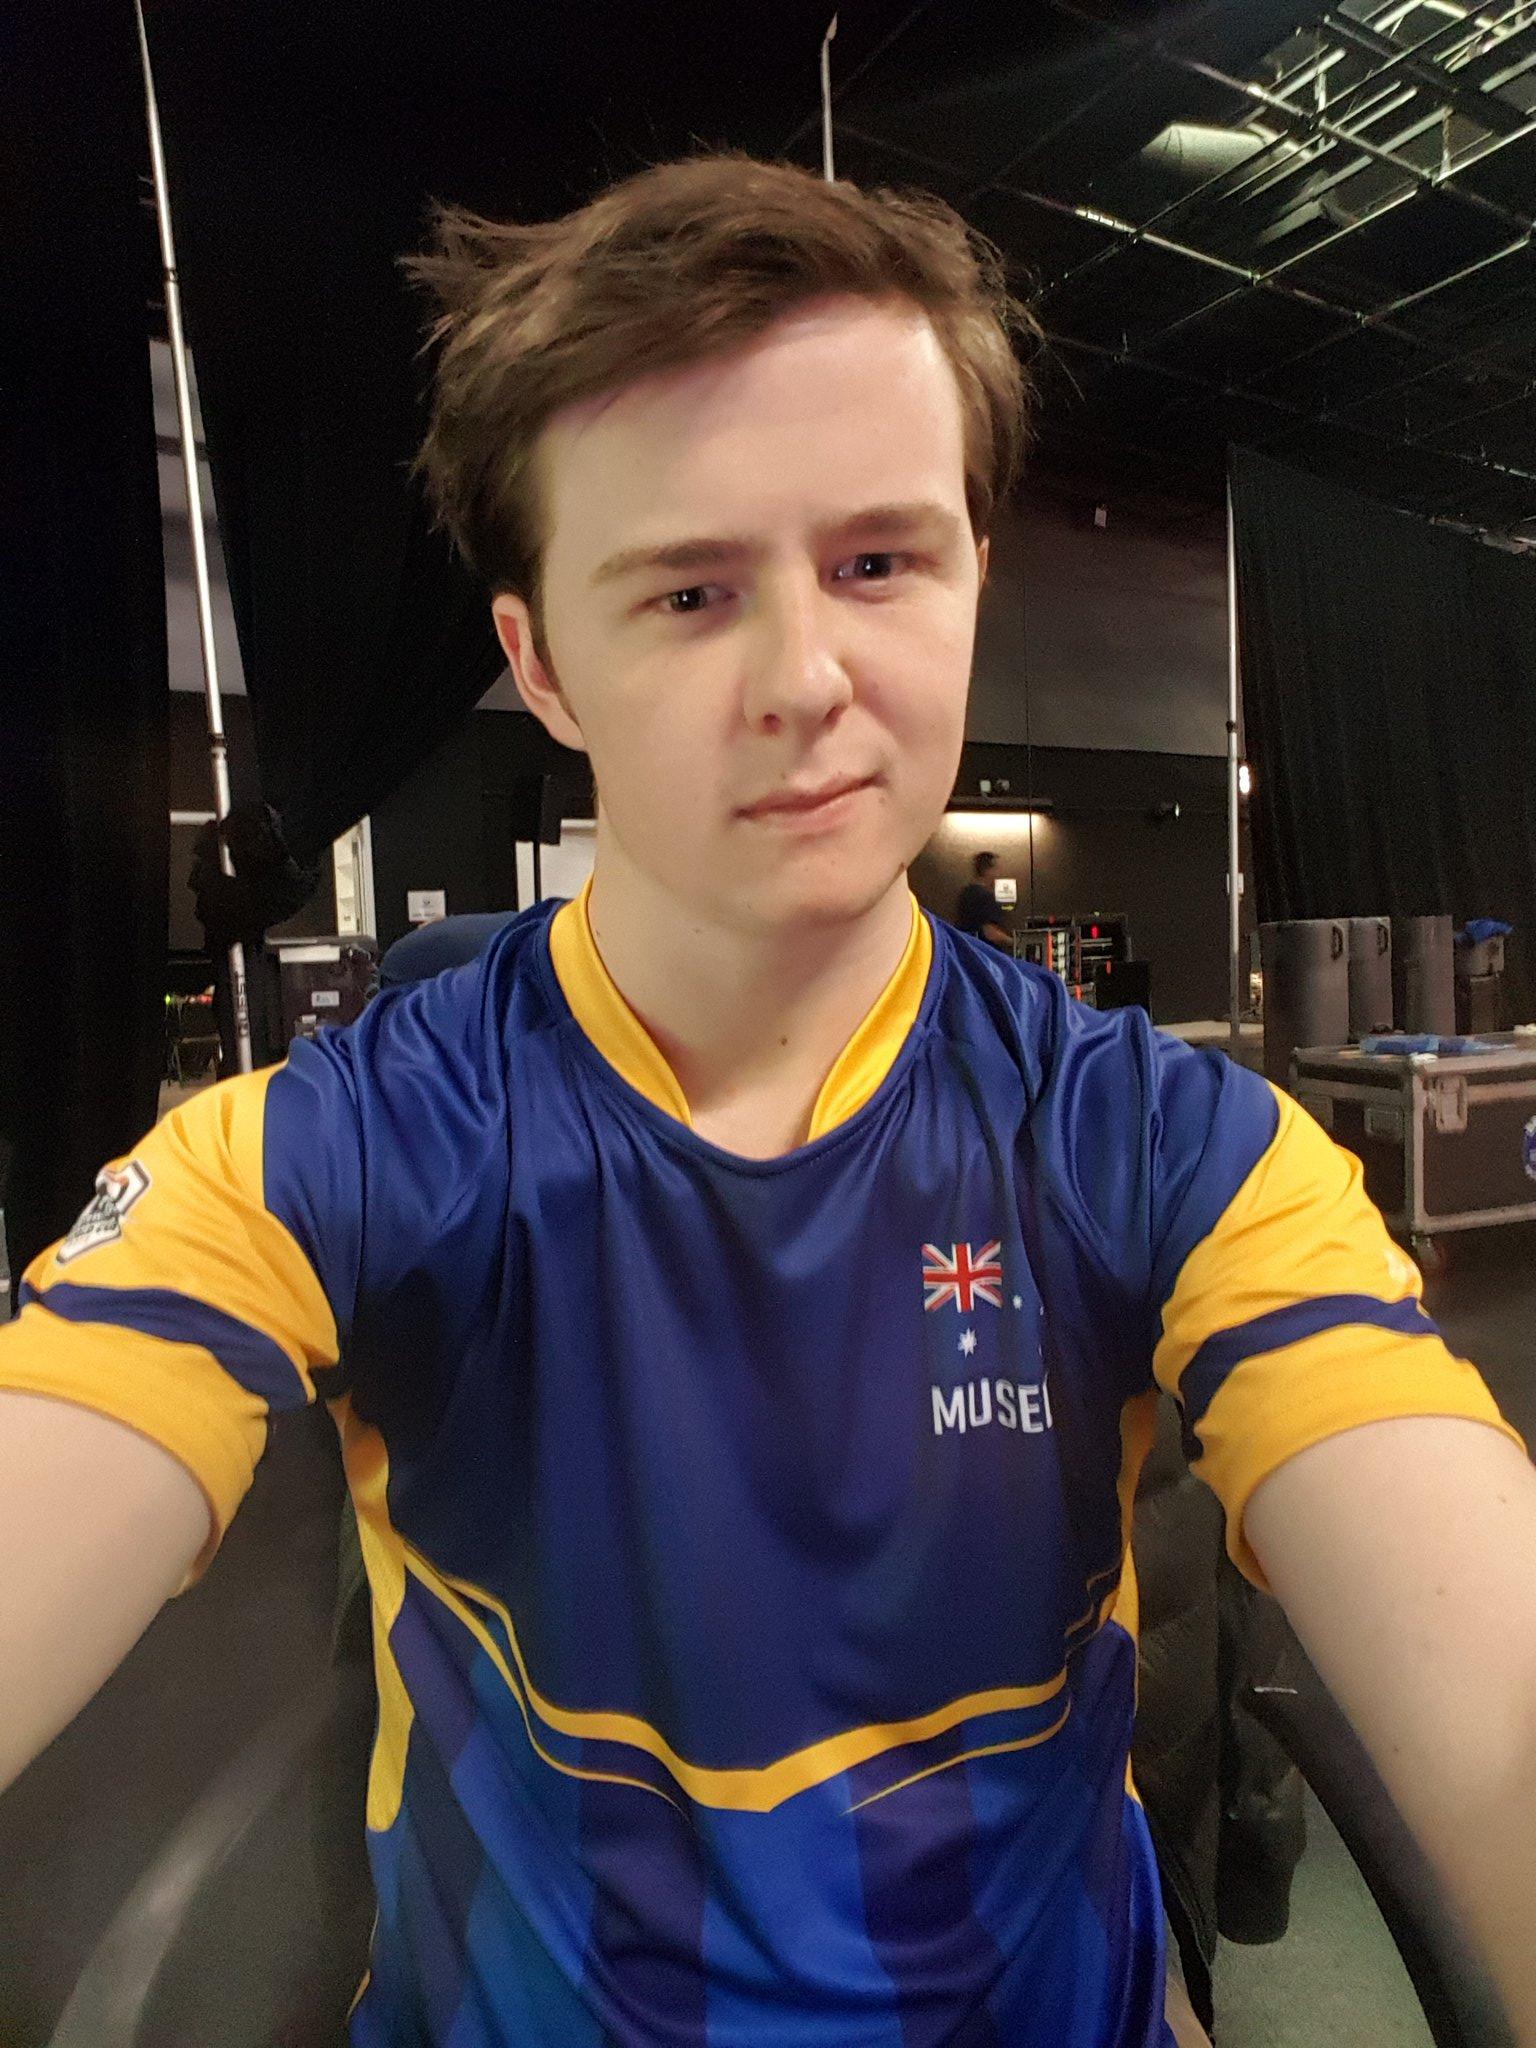 muselk on twitter   u0026quot team australia u0026 39 s world cup jersey